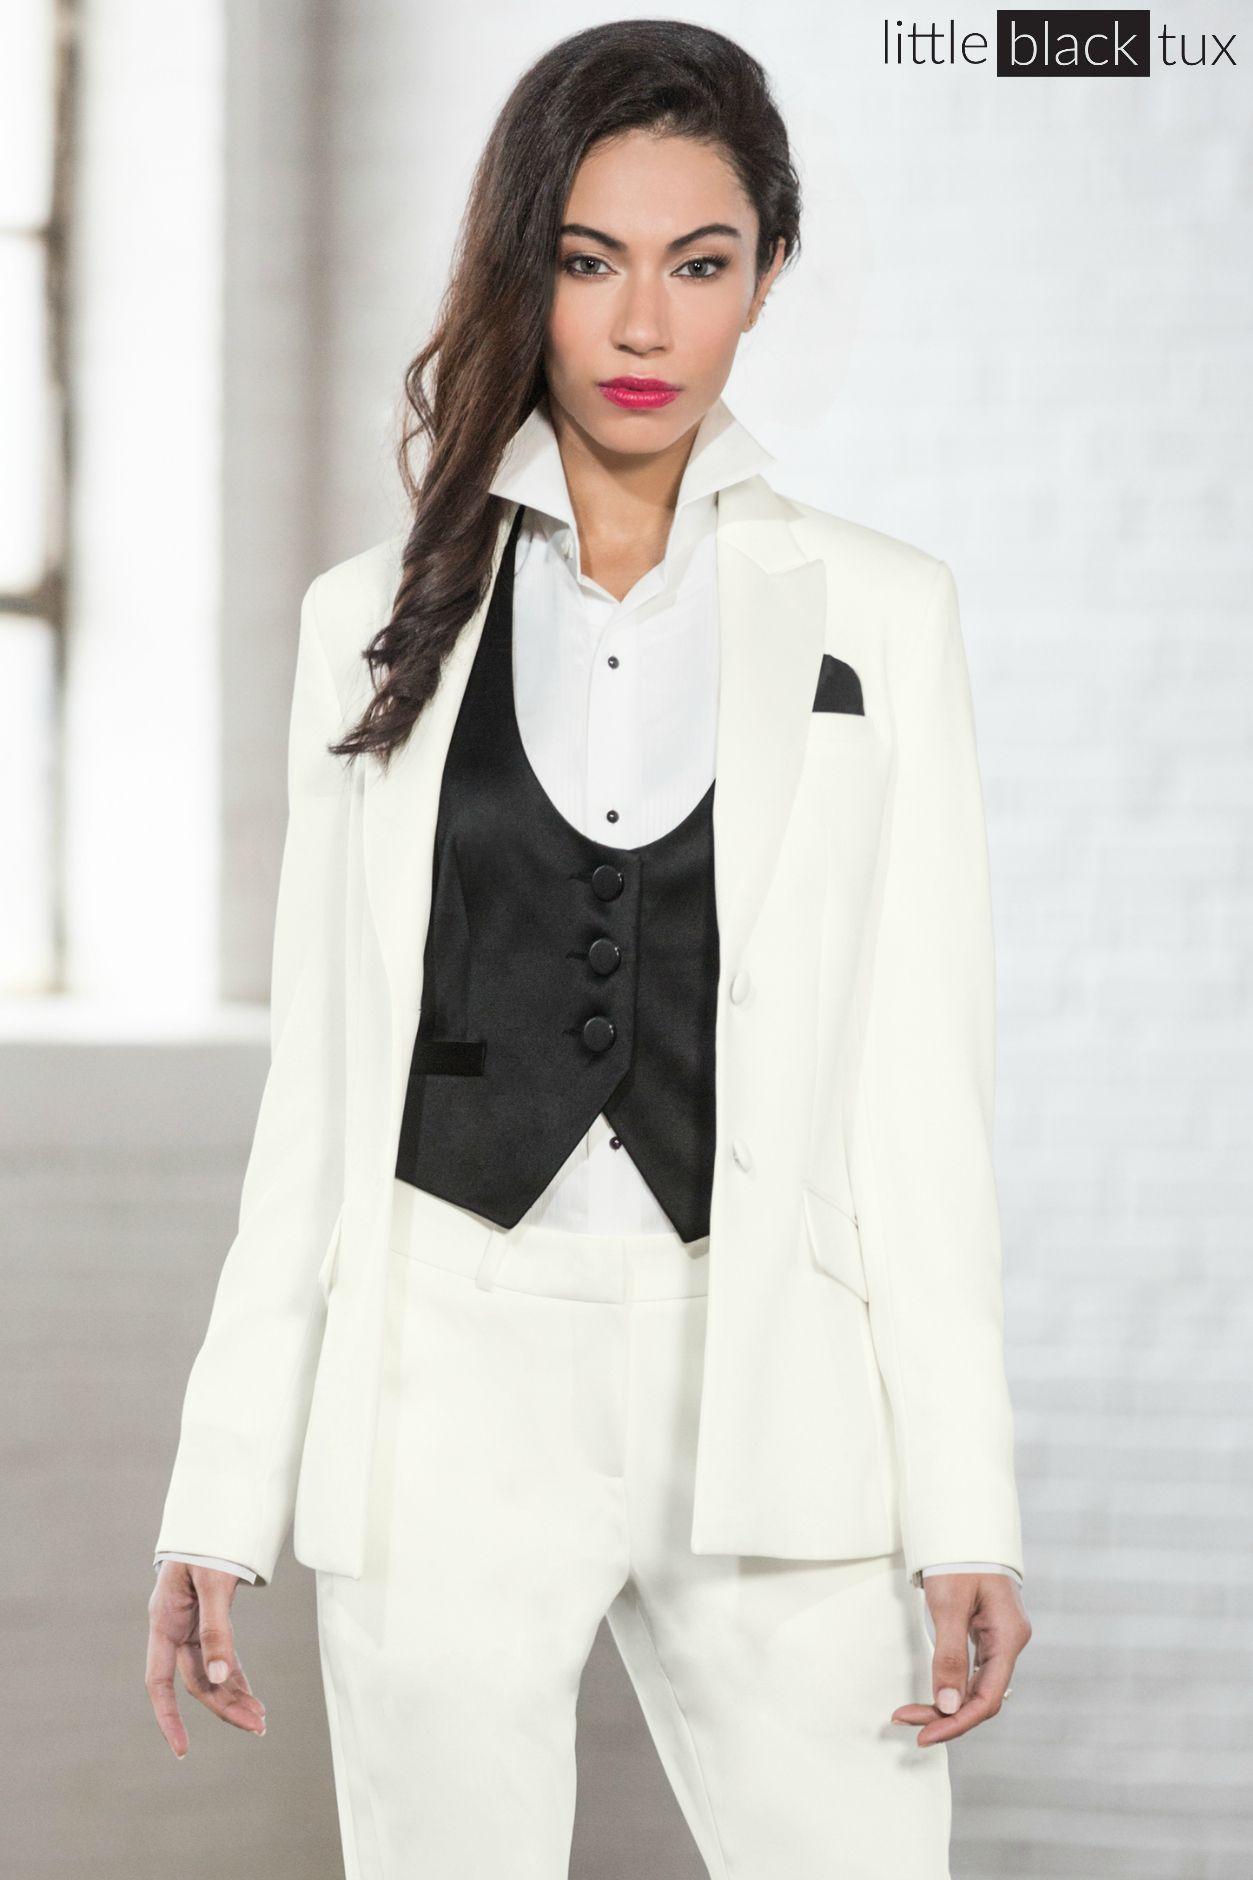 Women S Ivory Diamond White Tuxedo Ladytux Peak Lapel Slim Fit